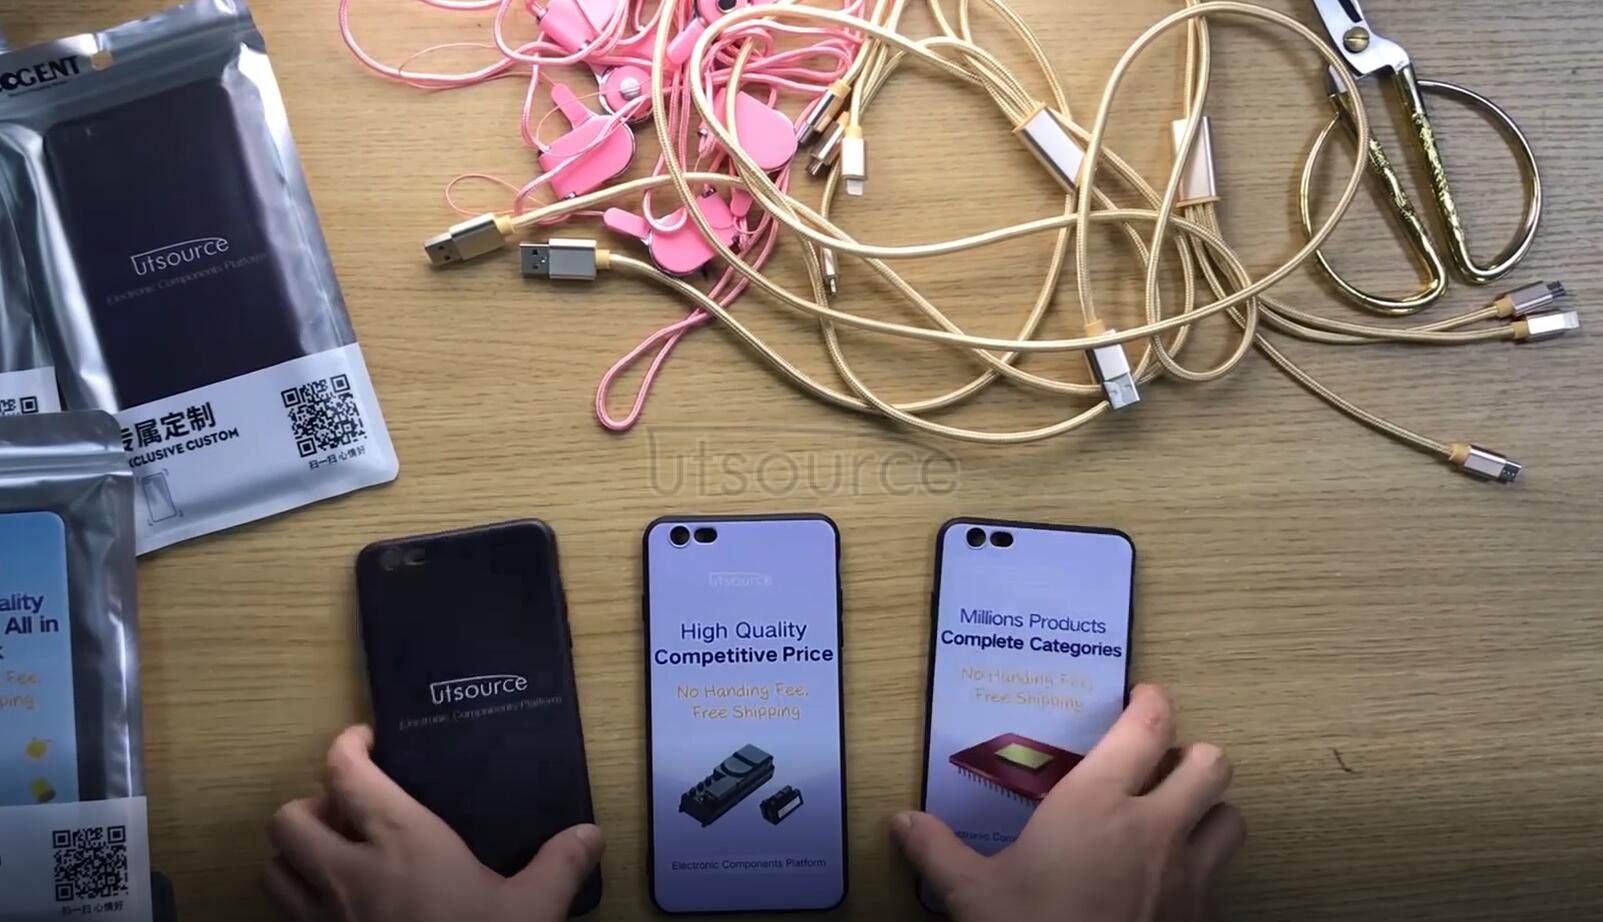 Unboxing video of Utsource custom phone cases